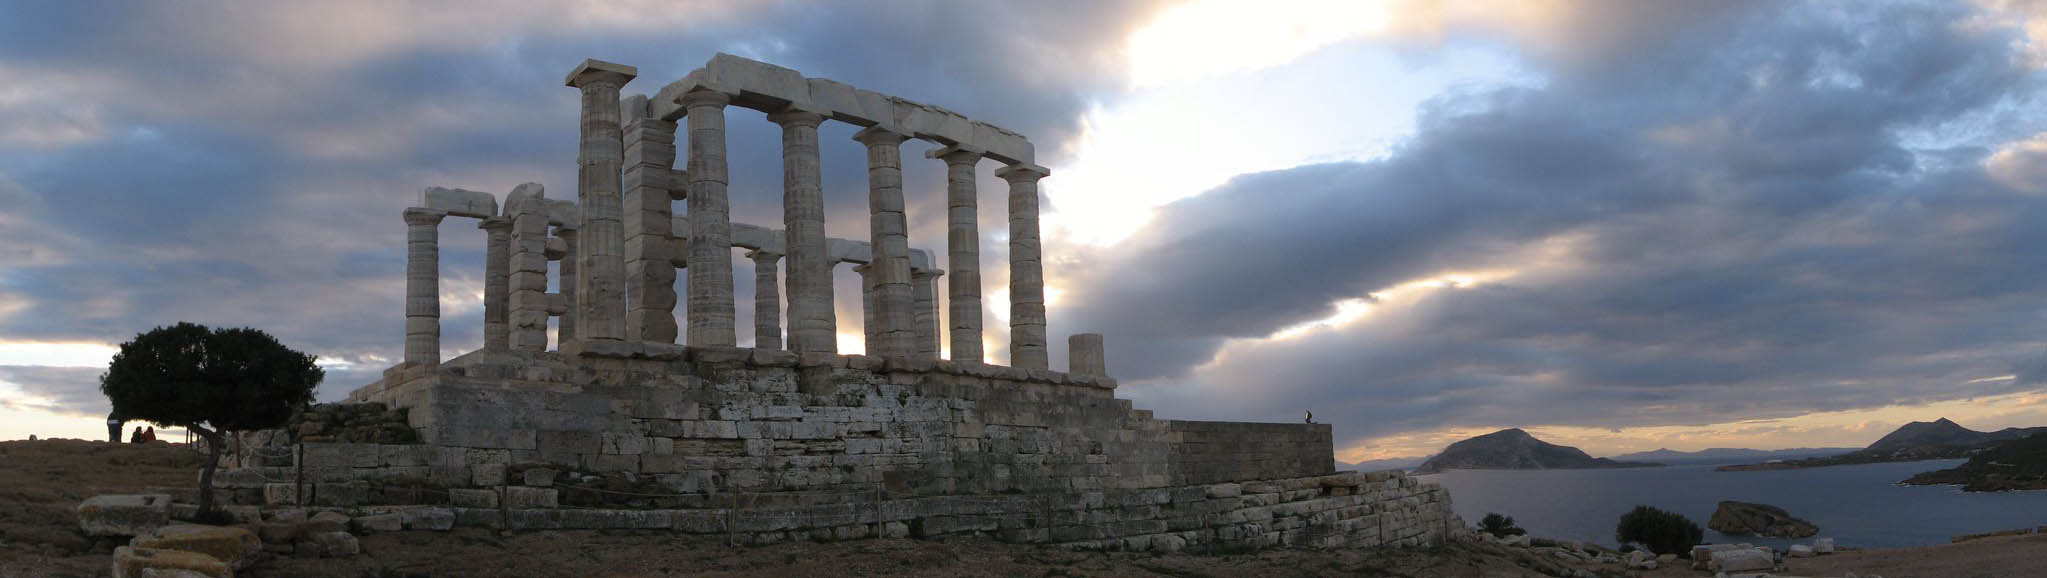 Храм Посейдона на мысе Сунион в Афинах